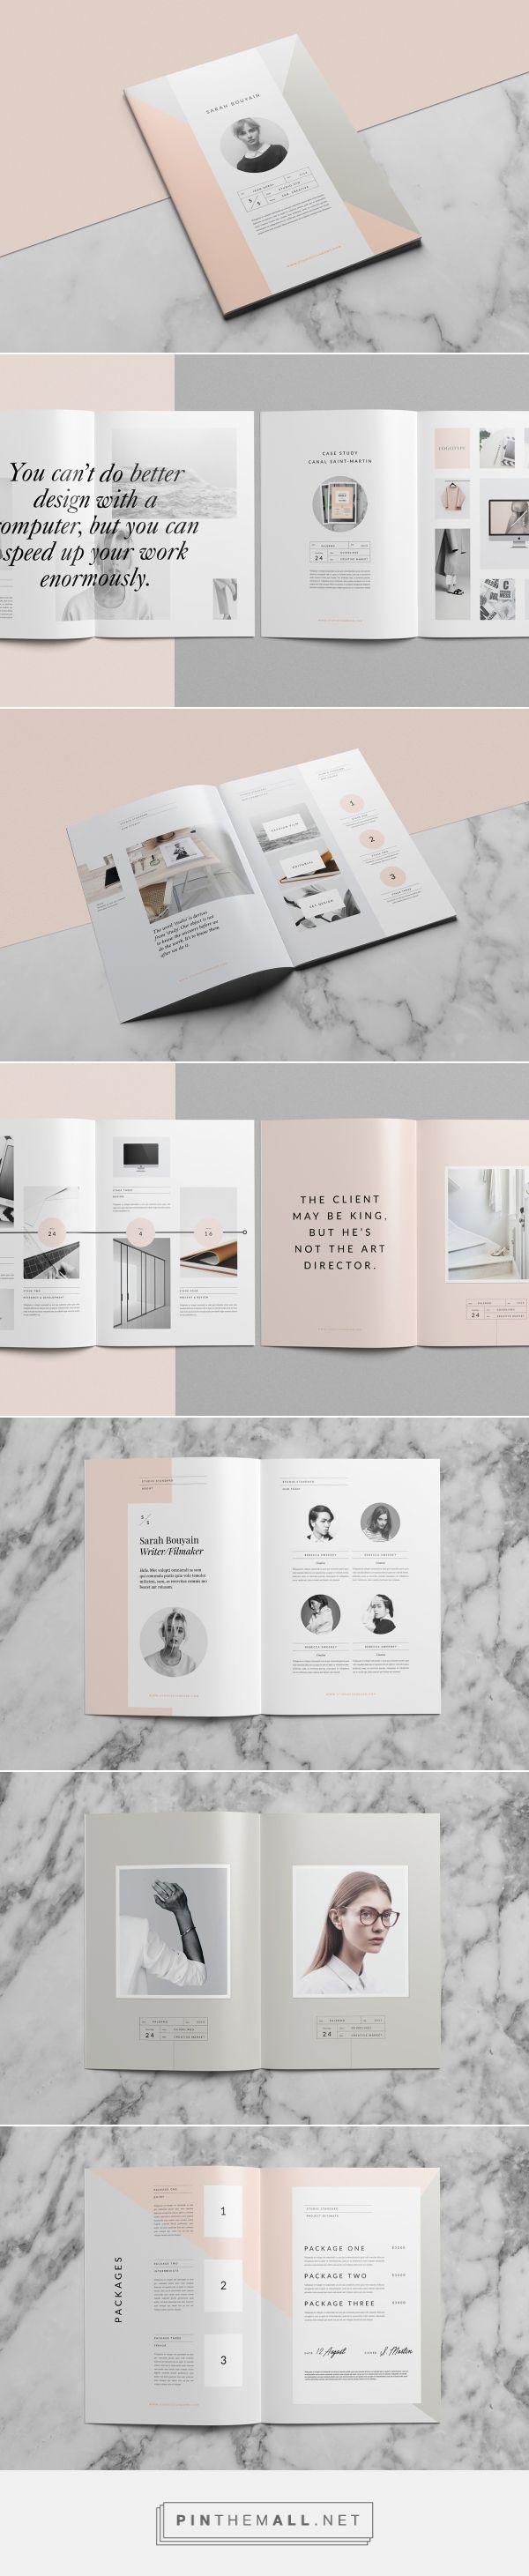 Deckblatt Design Pinte